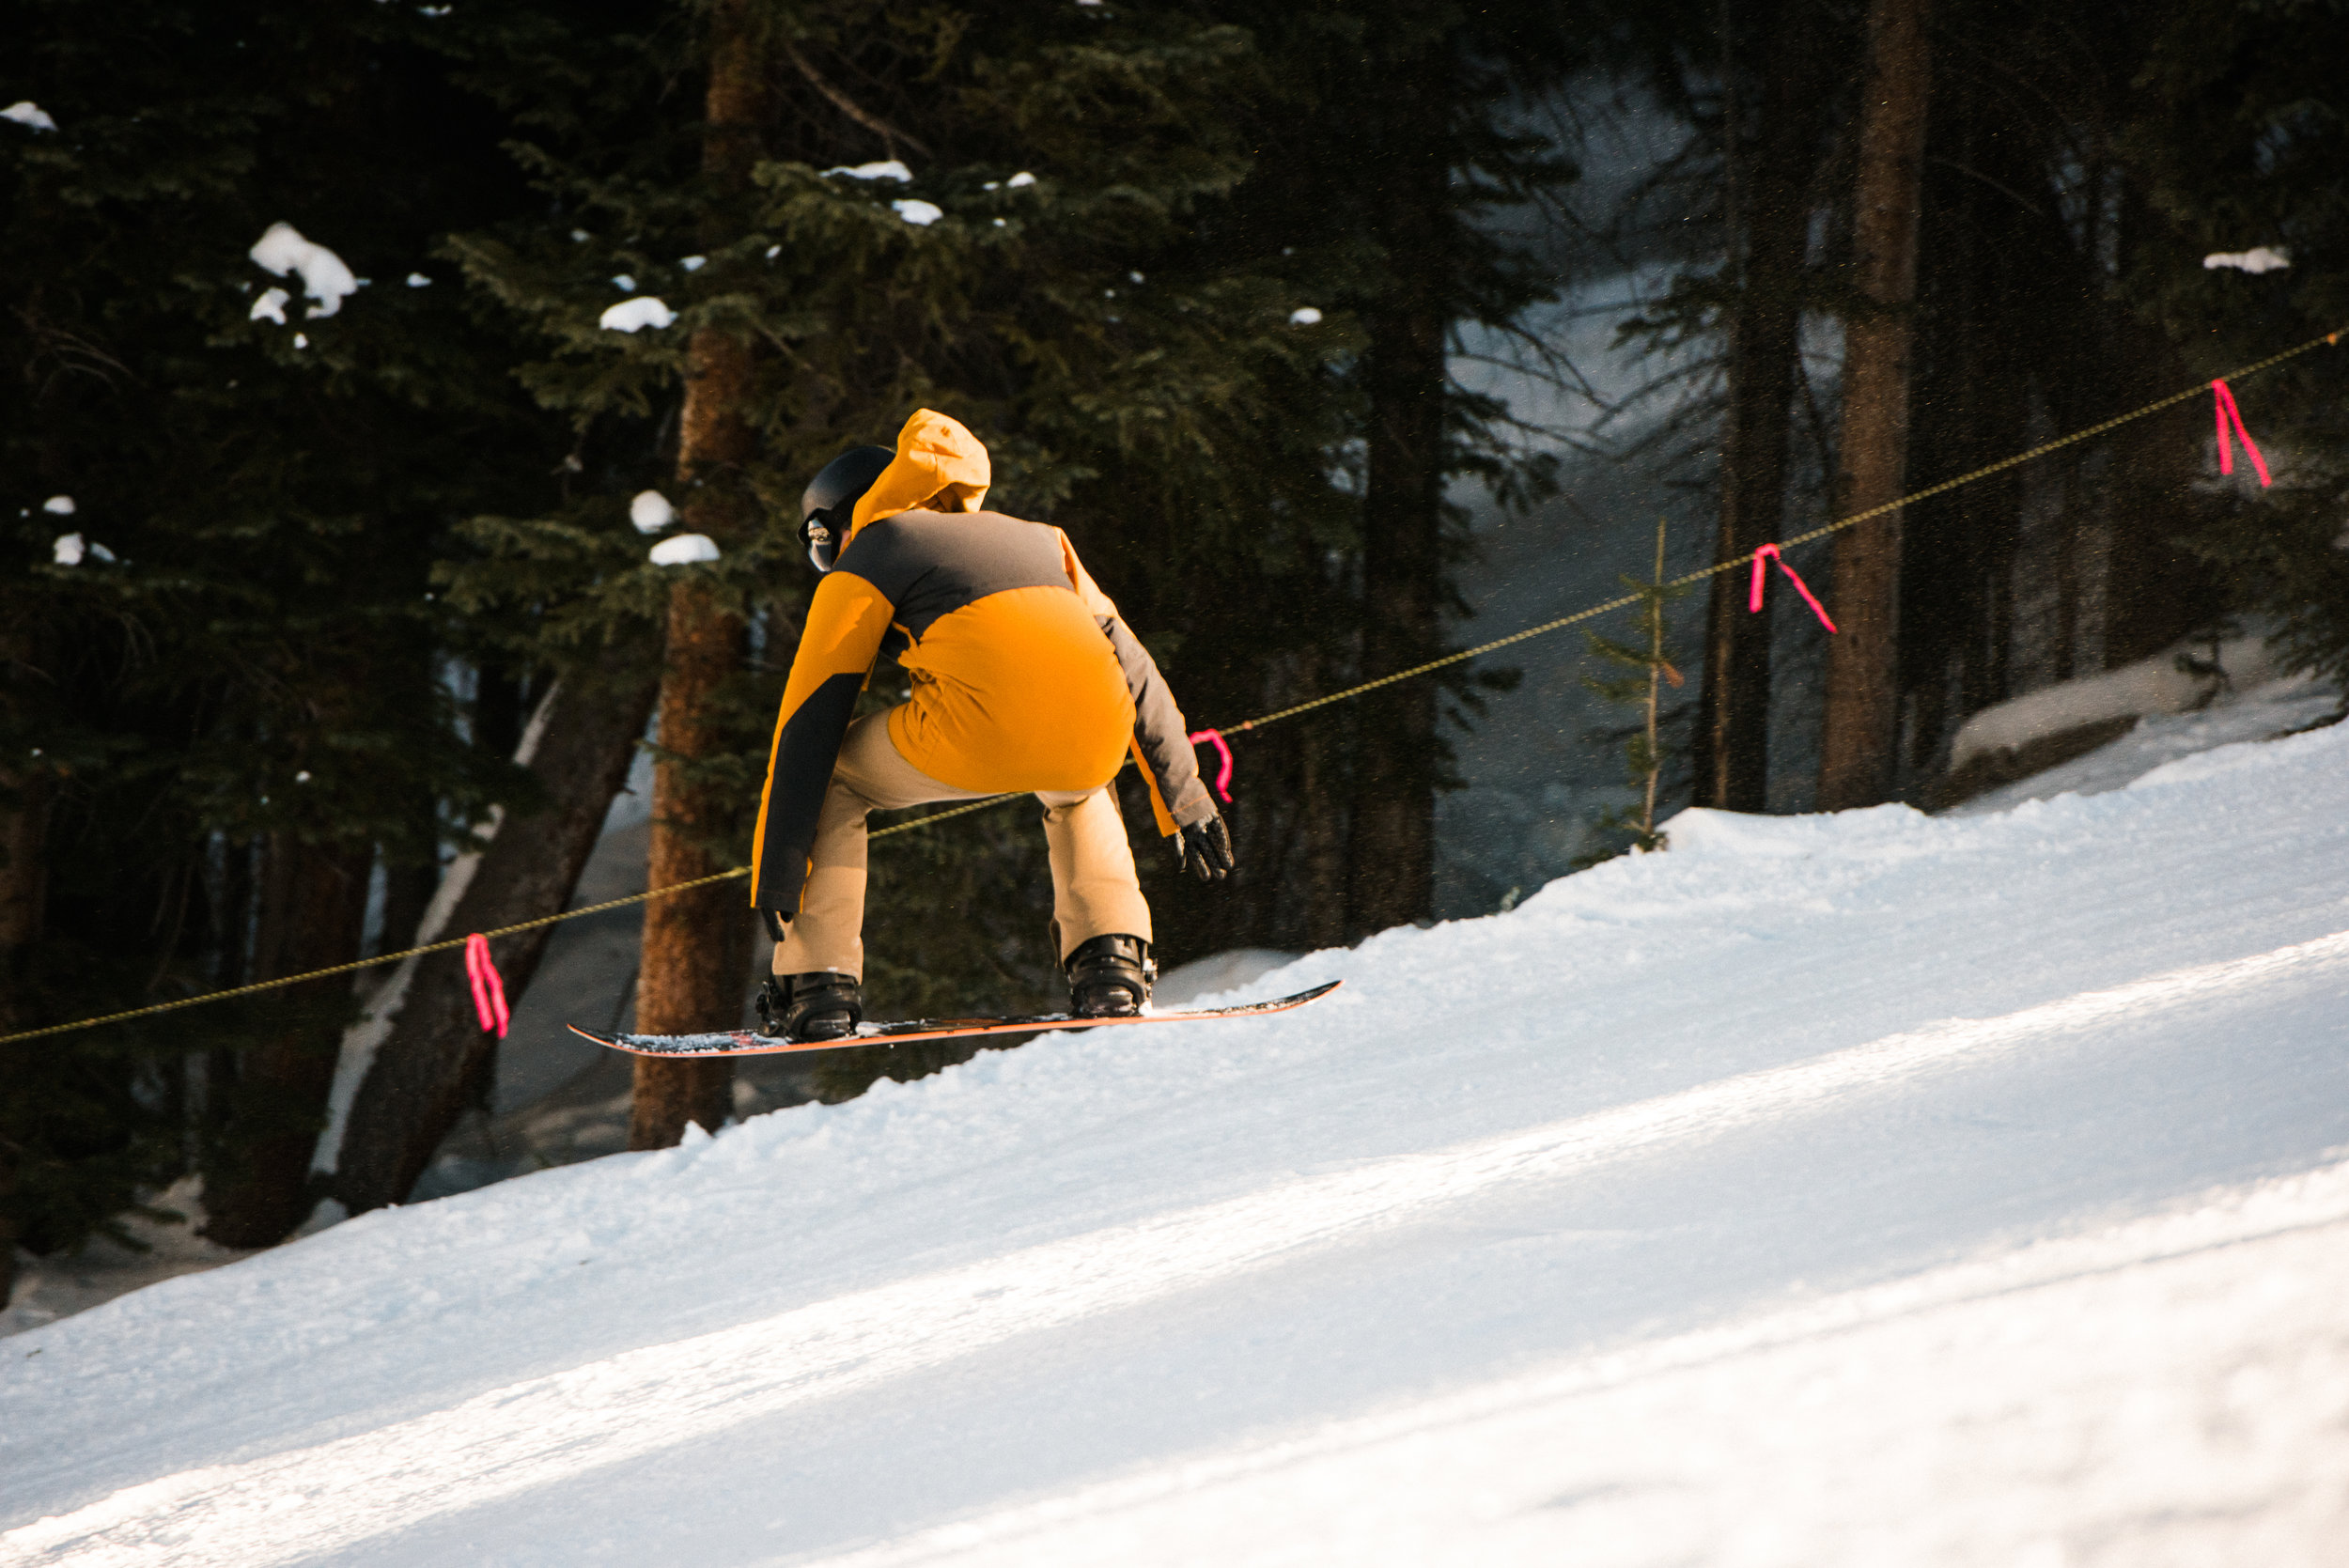 TaraShupe_Outdoor_Photographer_Loweprobags_Colorado_Copper_Mountains_Ski_52.jpg